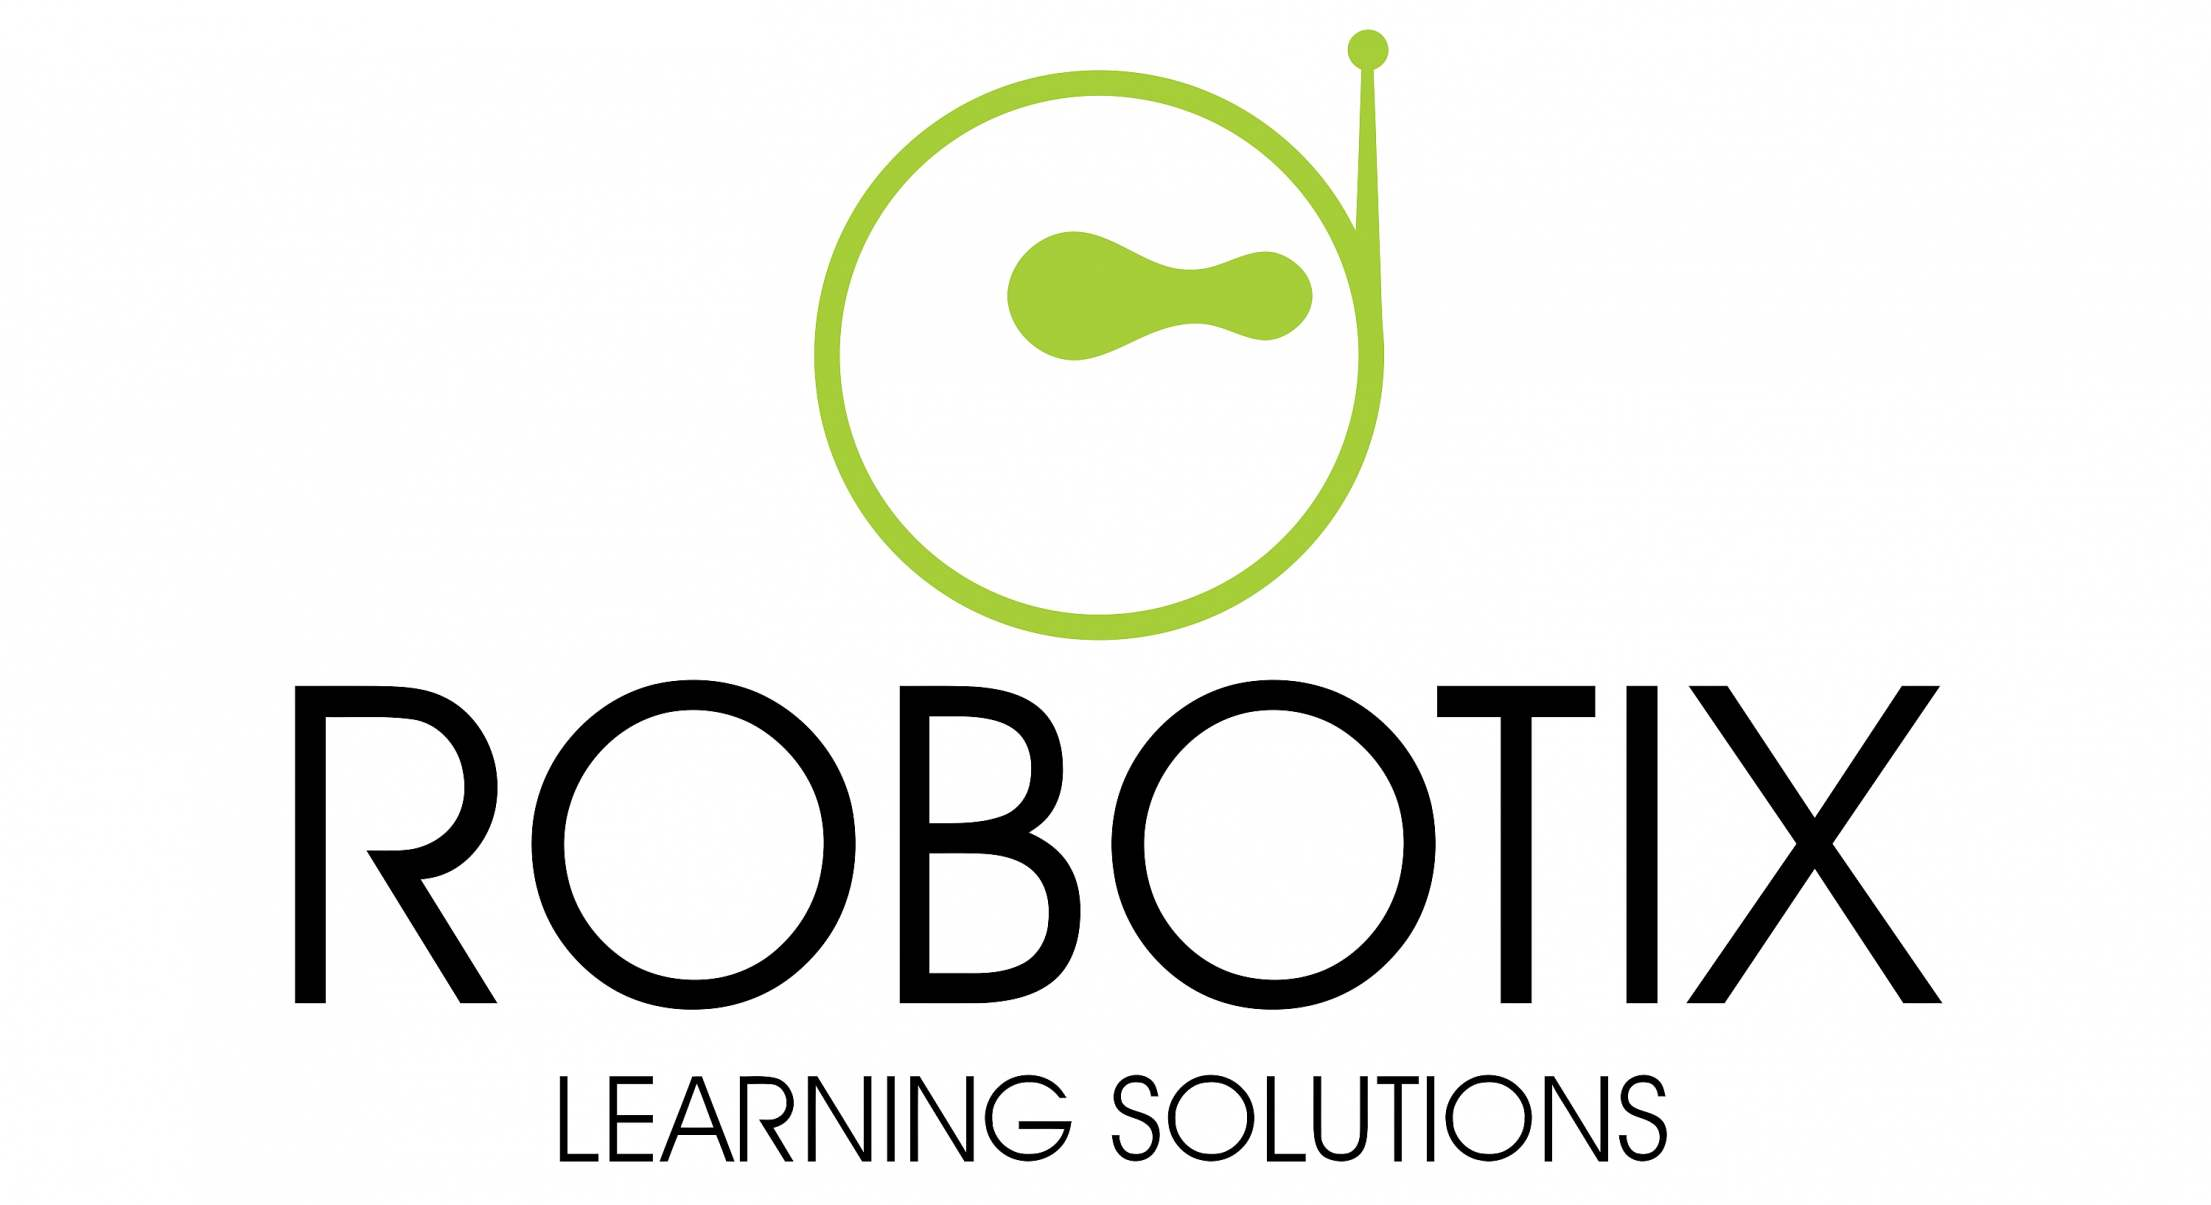 Robotix Learning Solutions Pvt. Ltd. Logo